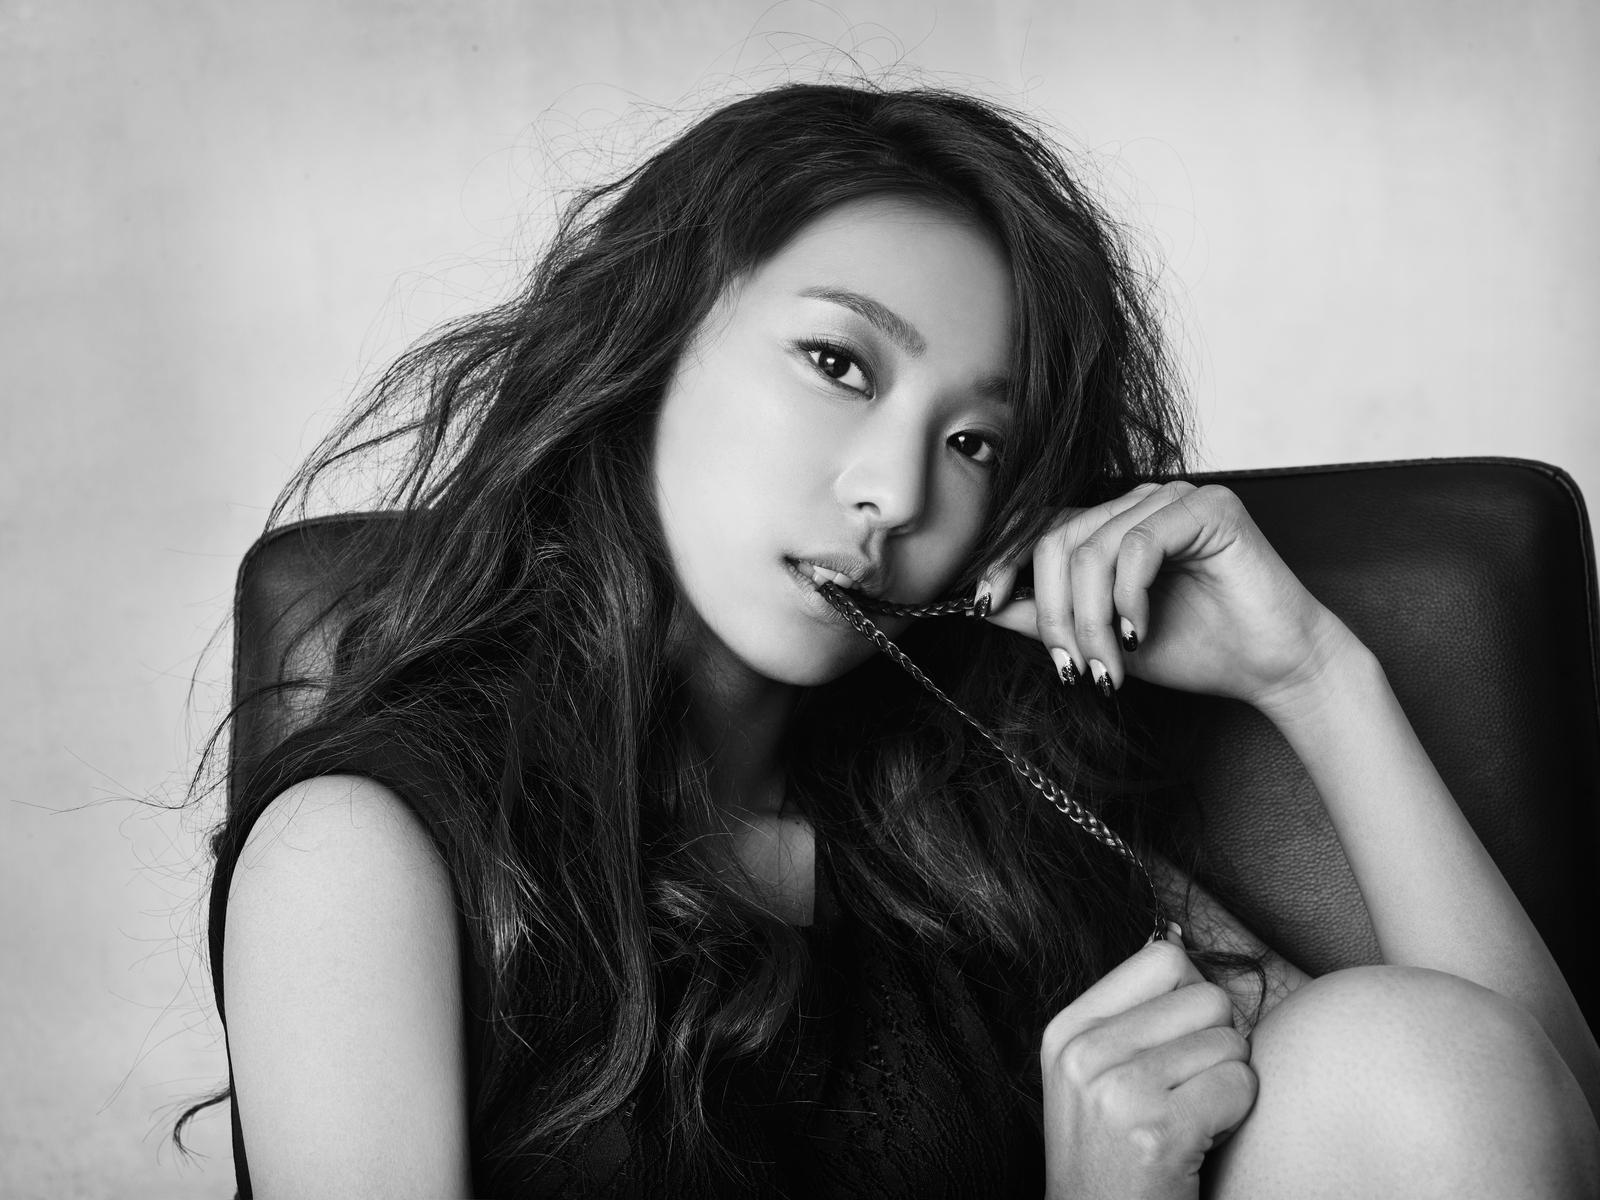 SISTAR's Bora Looks Unbelievably Hot in New MV Teaser